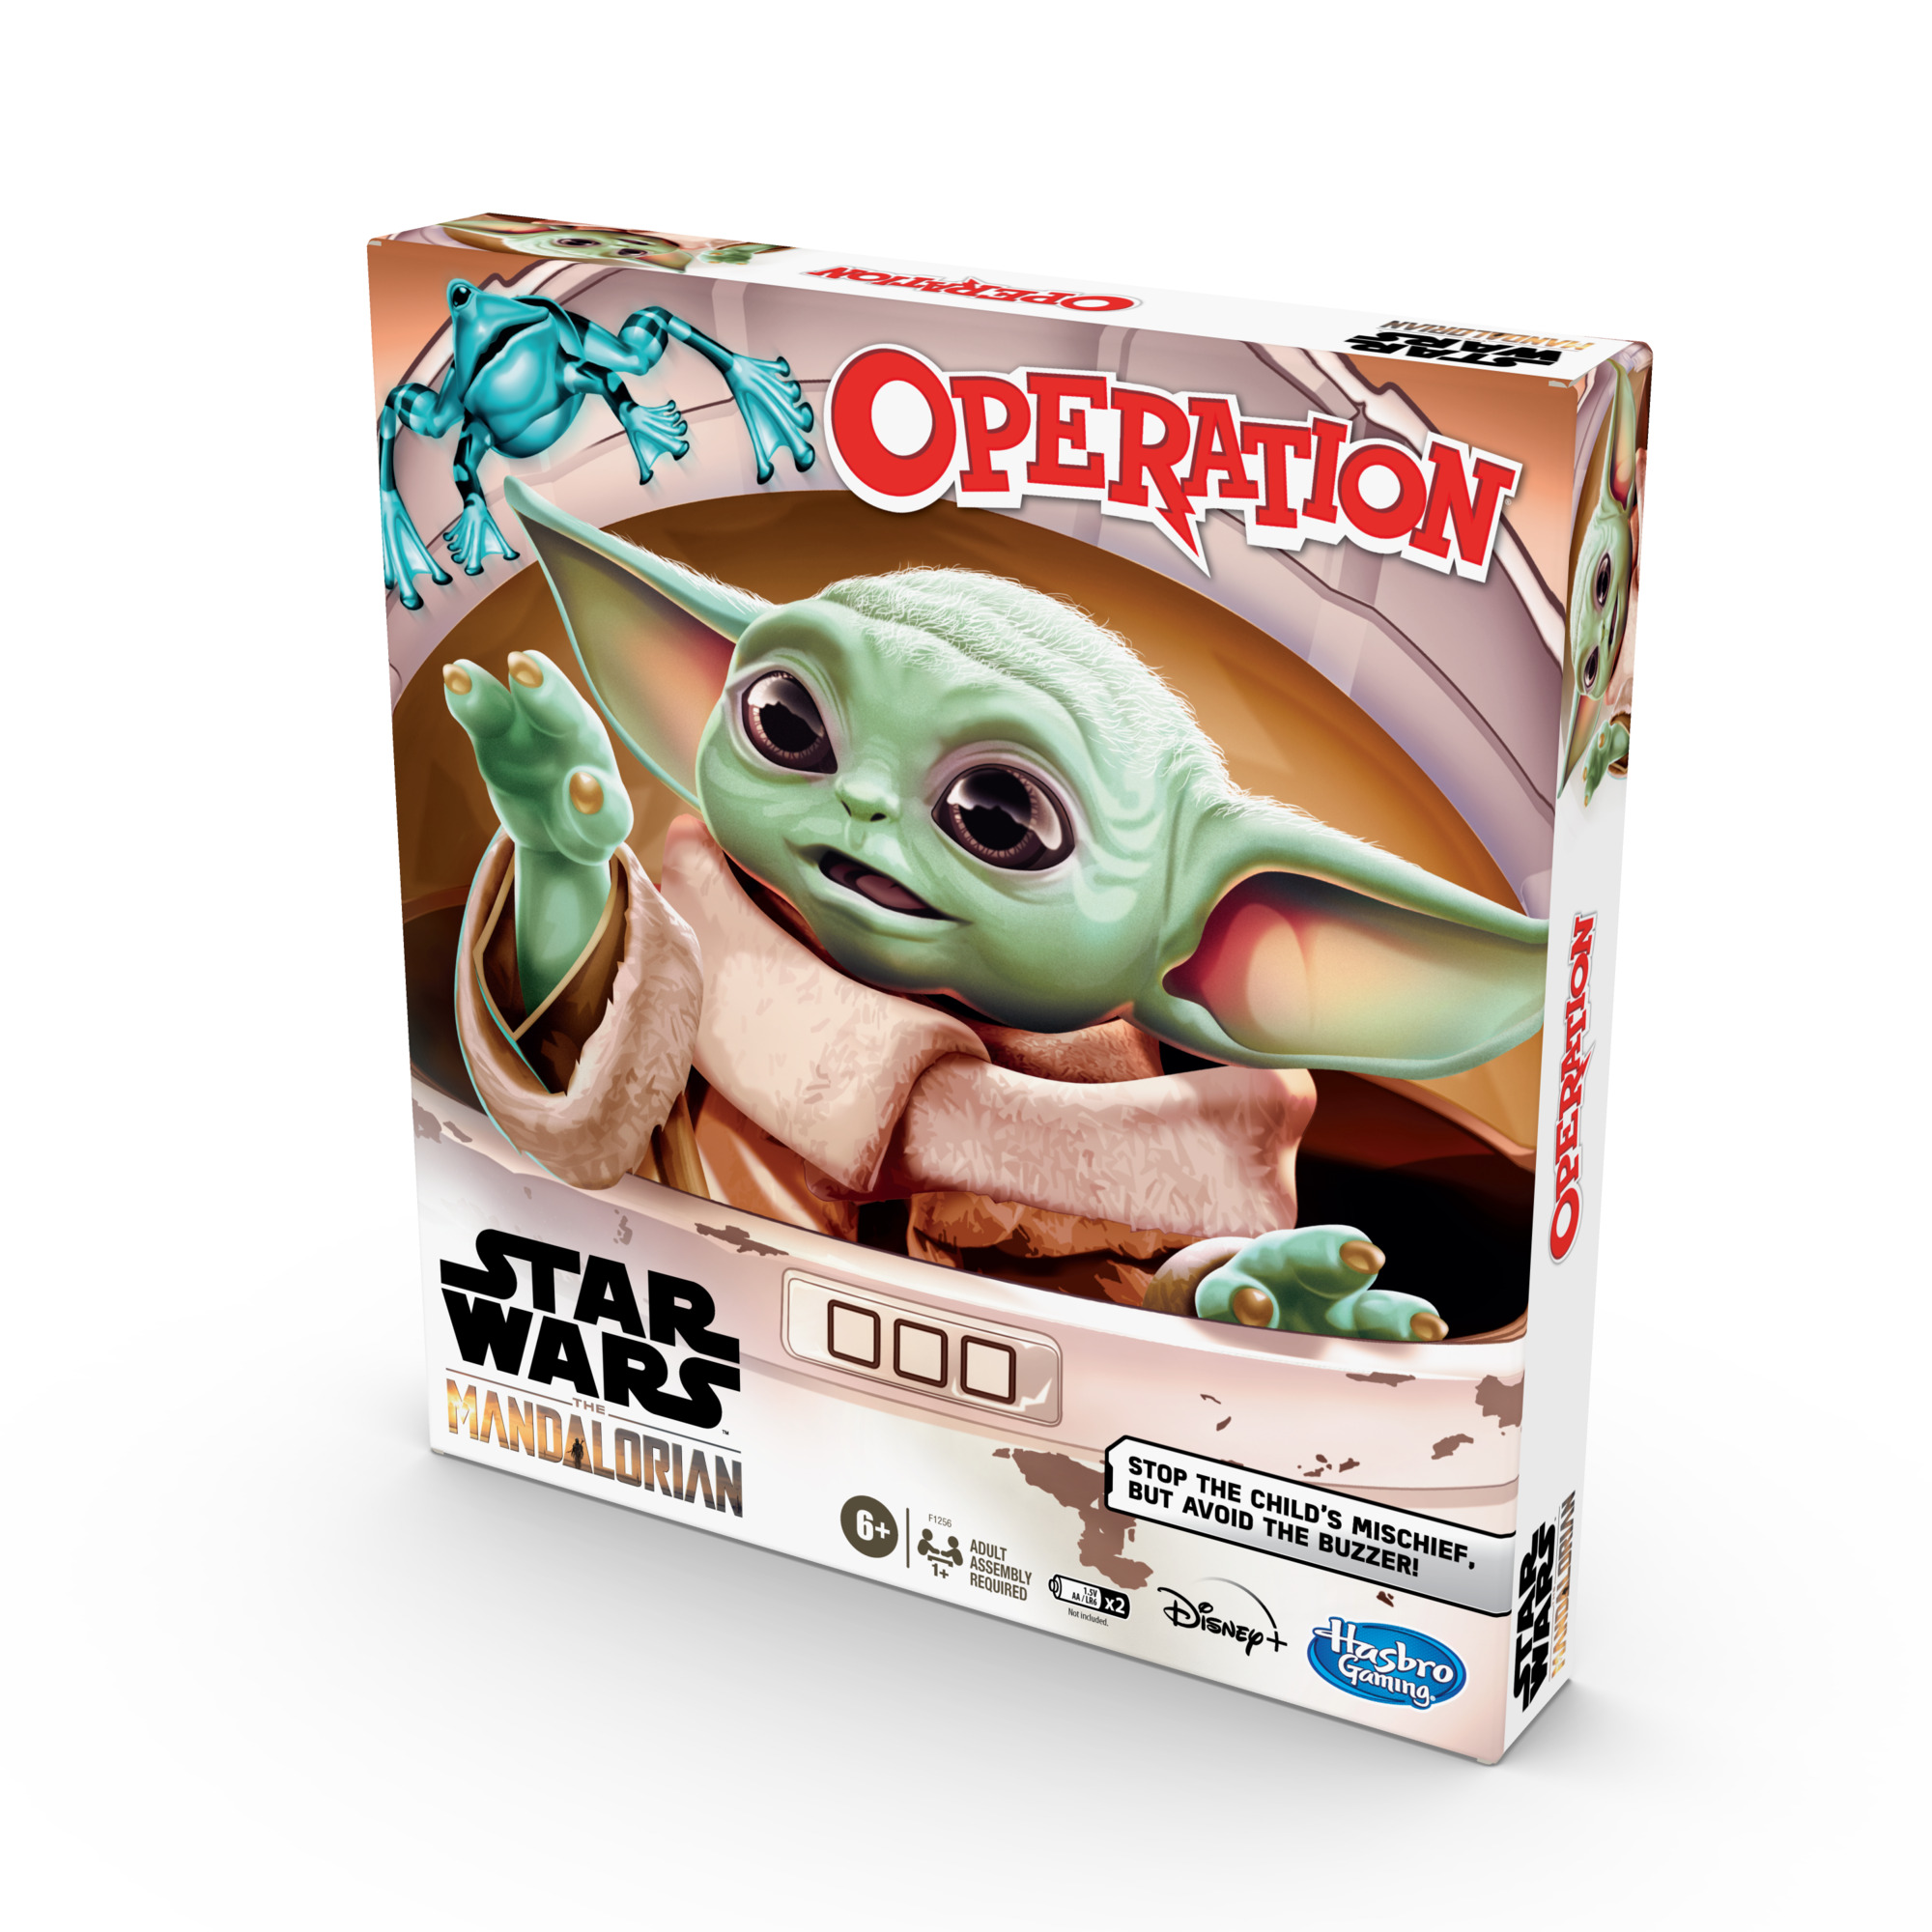 F12560000 Star Wars The Mandalorian Operation Game pkg2